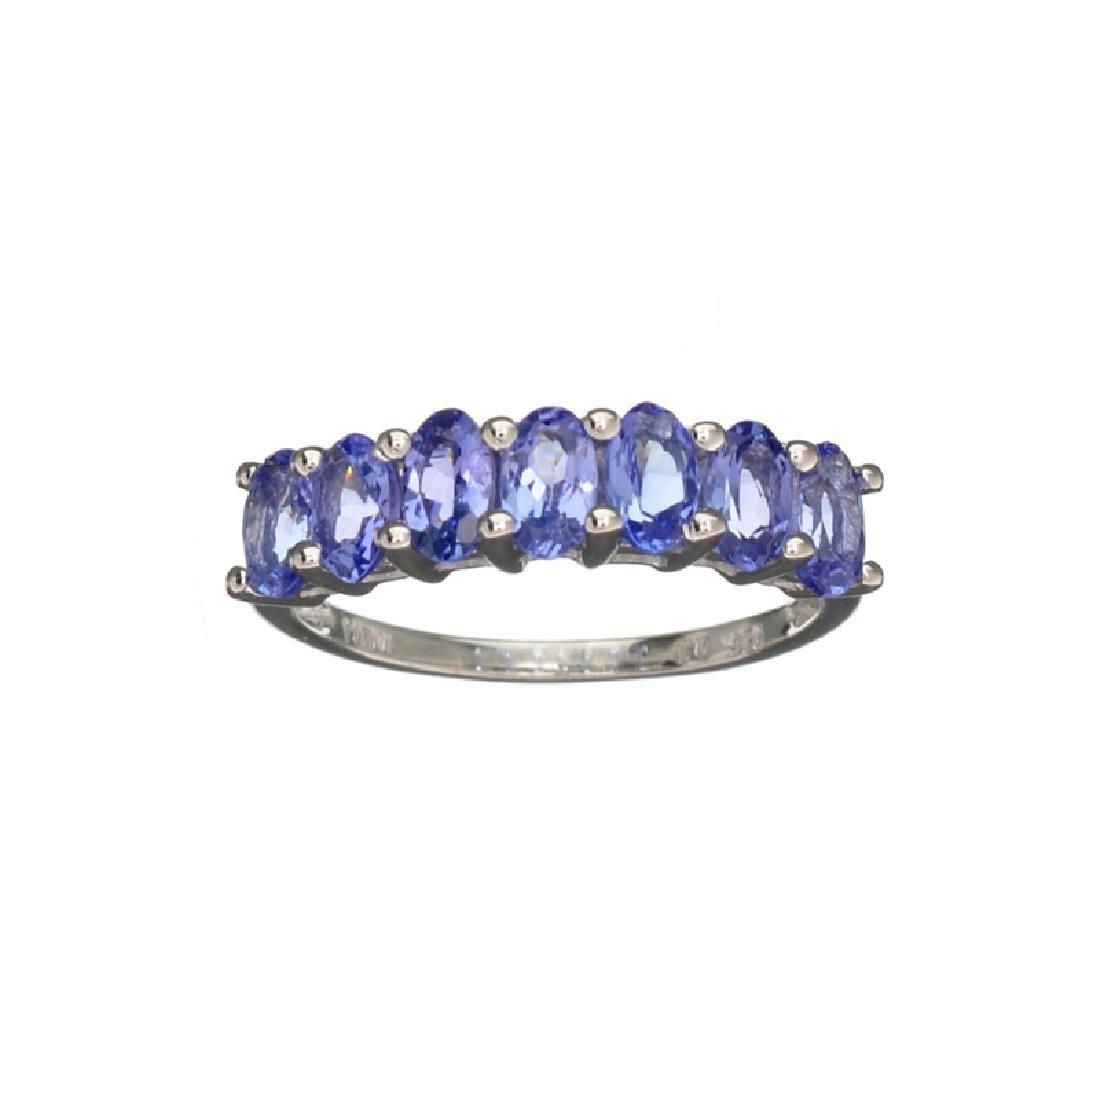 APP: 1.5k Fine Jewelry 1.75CT Oval Cut Tanzanite Over